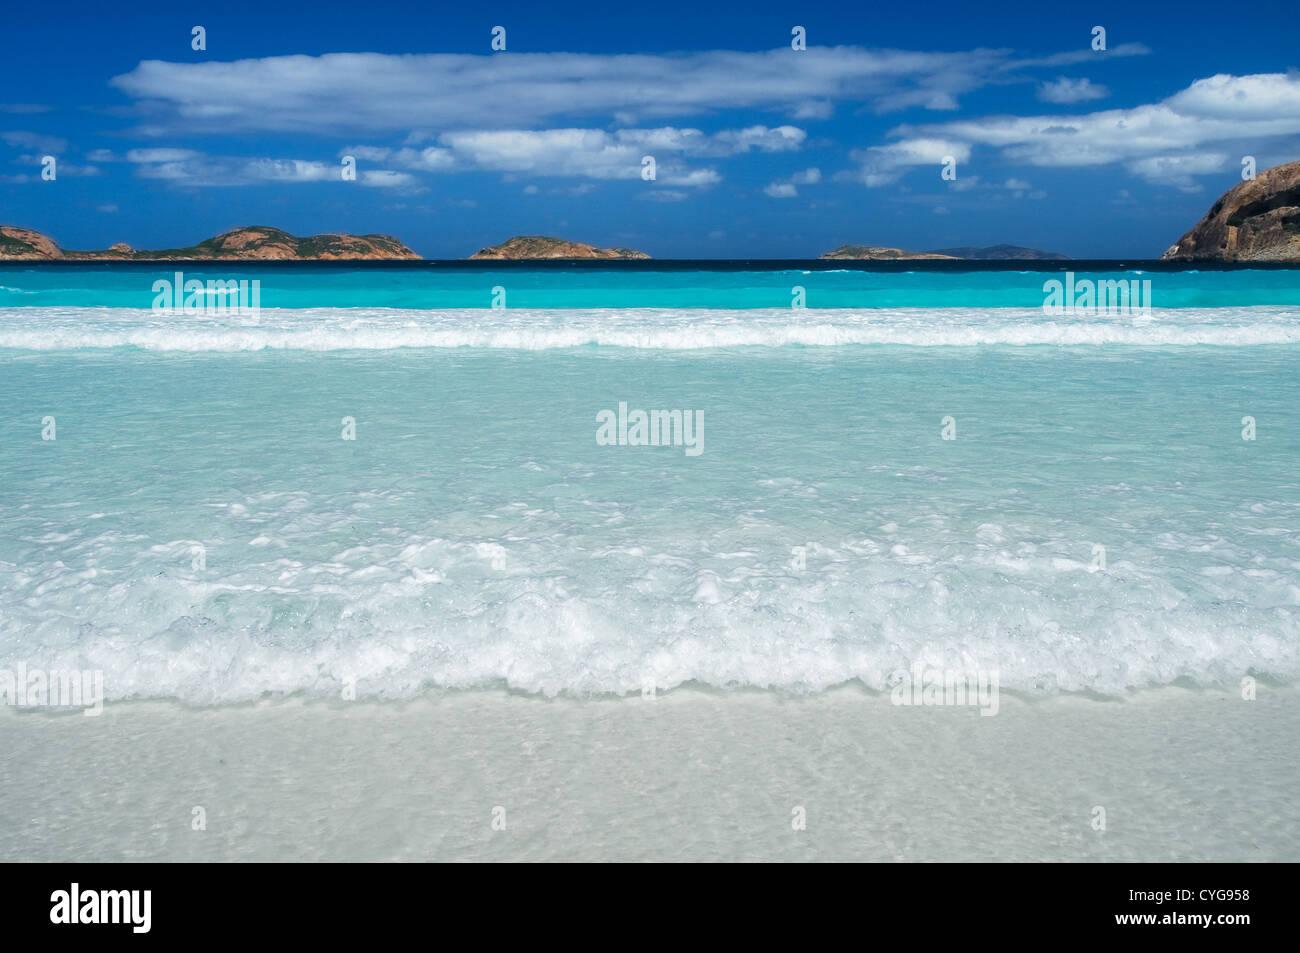 Türkisfarbene Wasser in Lucky Bay. Stockbild